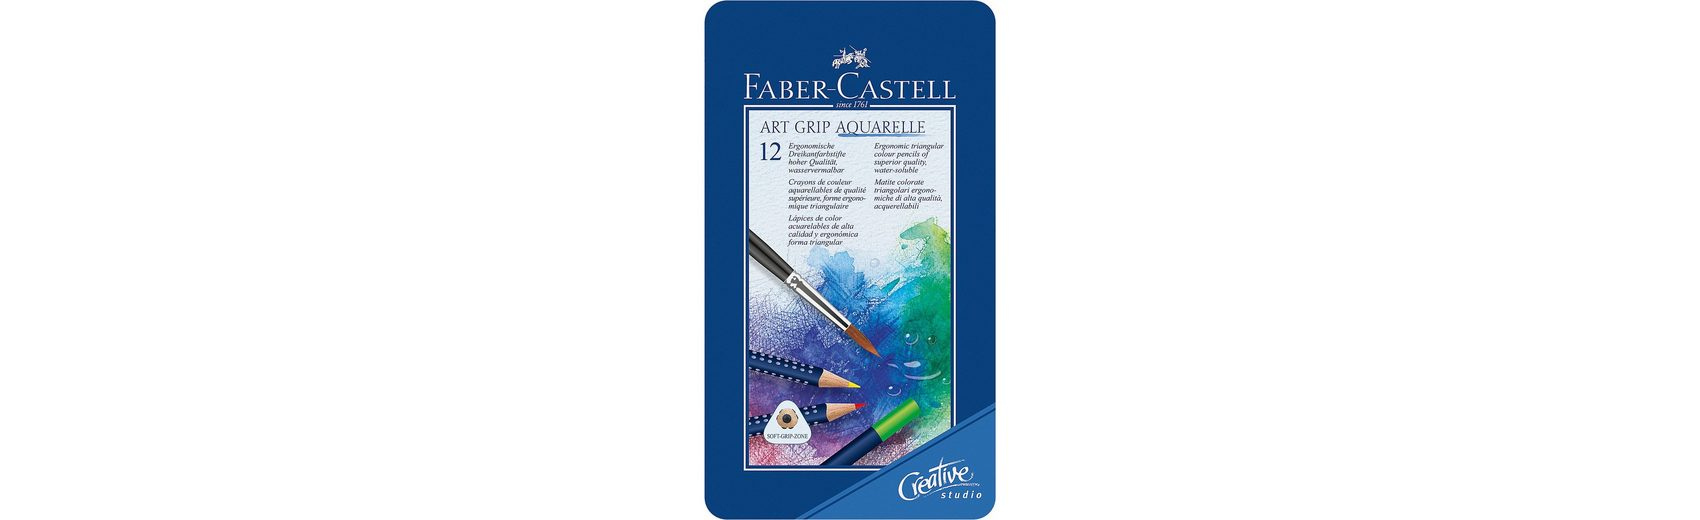 Faber-Castell Aquarell Buntstifte Art Grip Aquarelle im Etui, 12 Farben